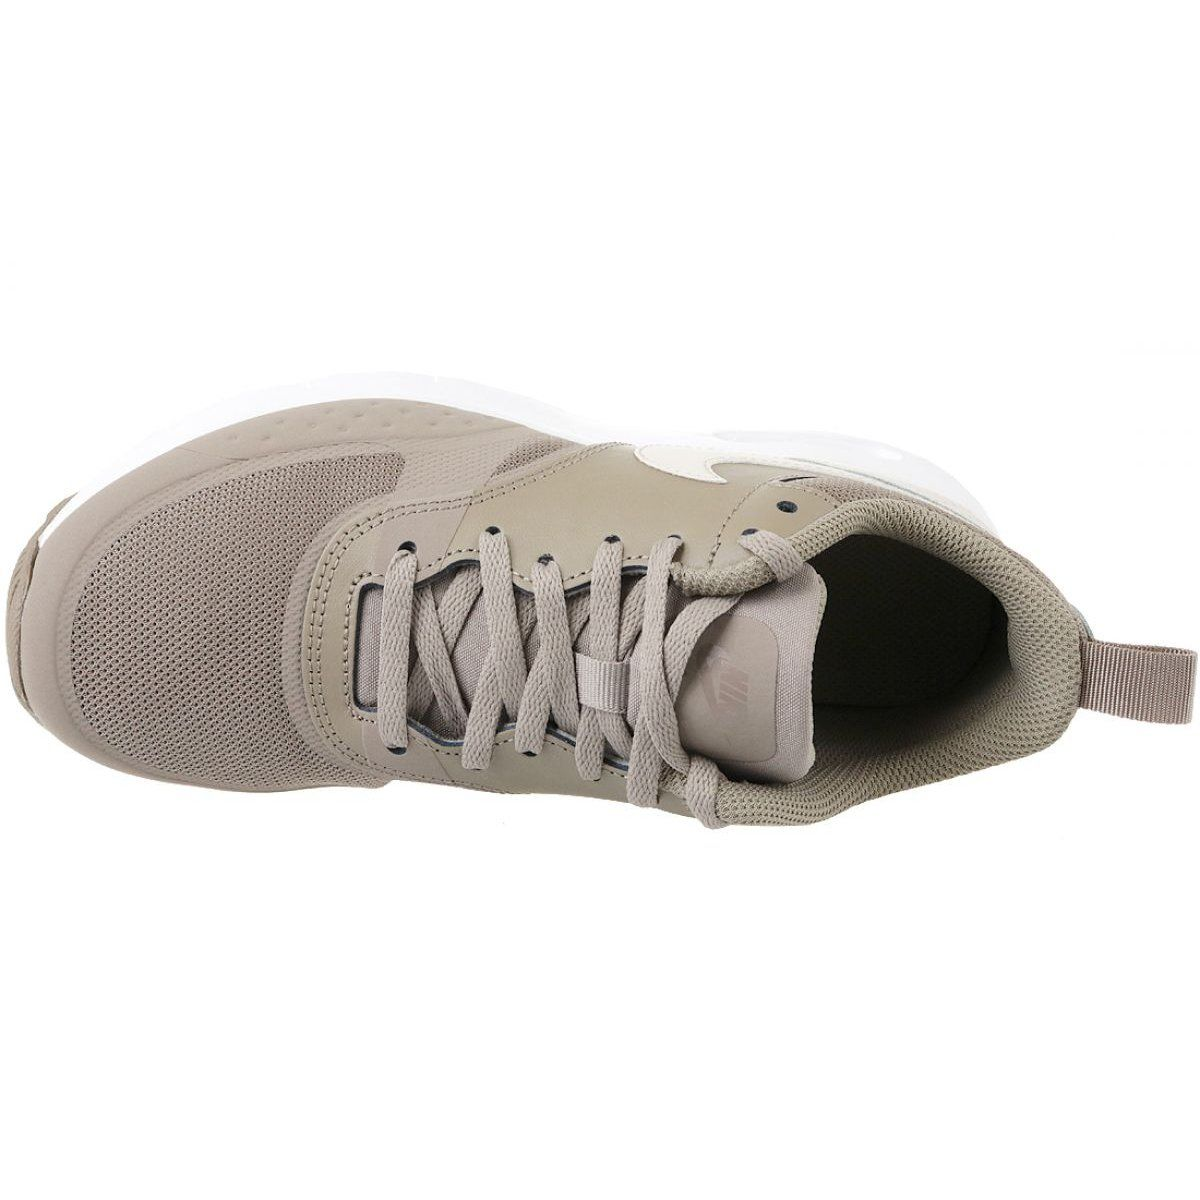 Buty Nike Air Max Vision Gs Jr 917857 200 brązowe   Buty